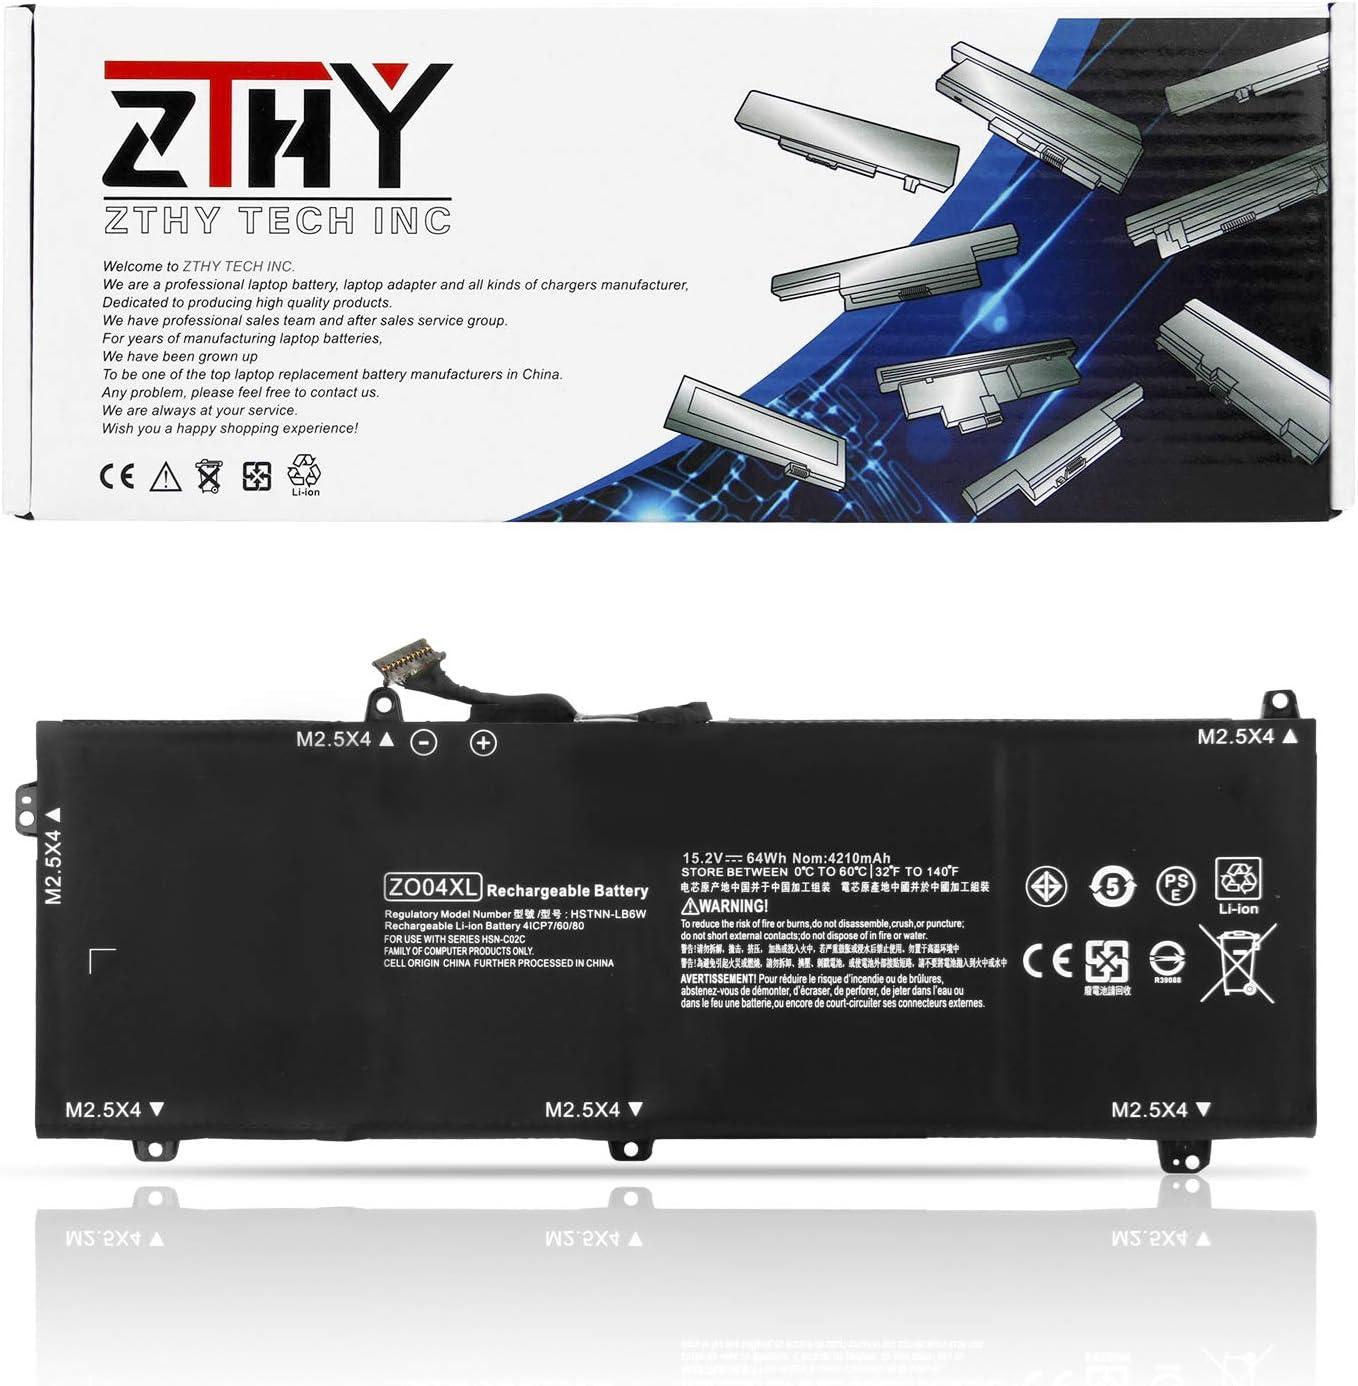 ZTHY ZO04XL Laptop Battery Replacement for HP ZBook Studio G3 G4 Mobile Workstation Series ZO04 ZO06 ZO06XL 808396-421 808450-001 HSTNN-CS8C HSTNN-C88C HSTNN-LB6W 15.2V 64Wh